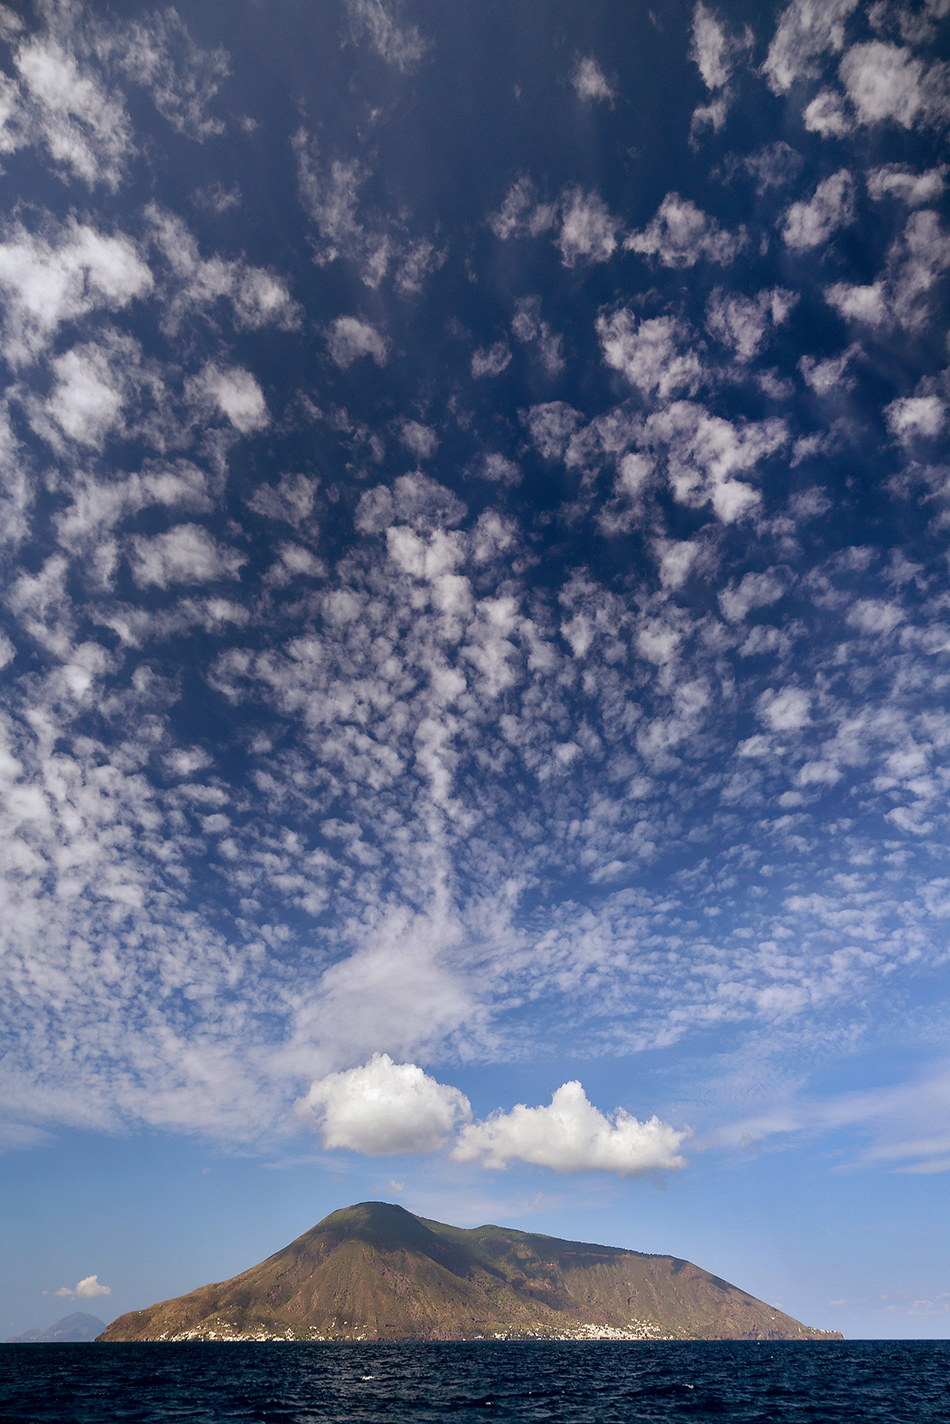 La isla de Stromboli rodeada de nubes | Foto © Carlos Díaz